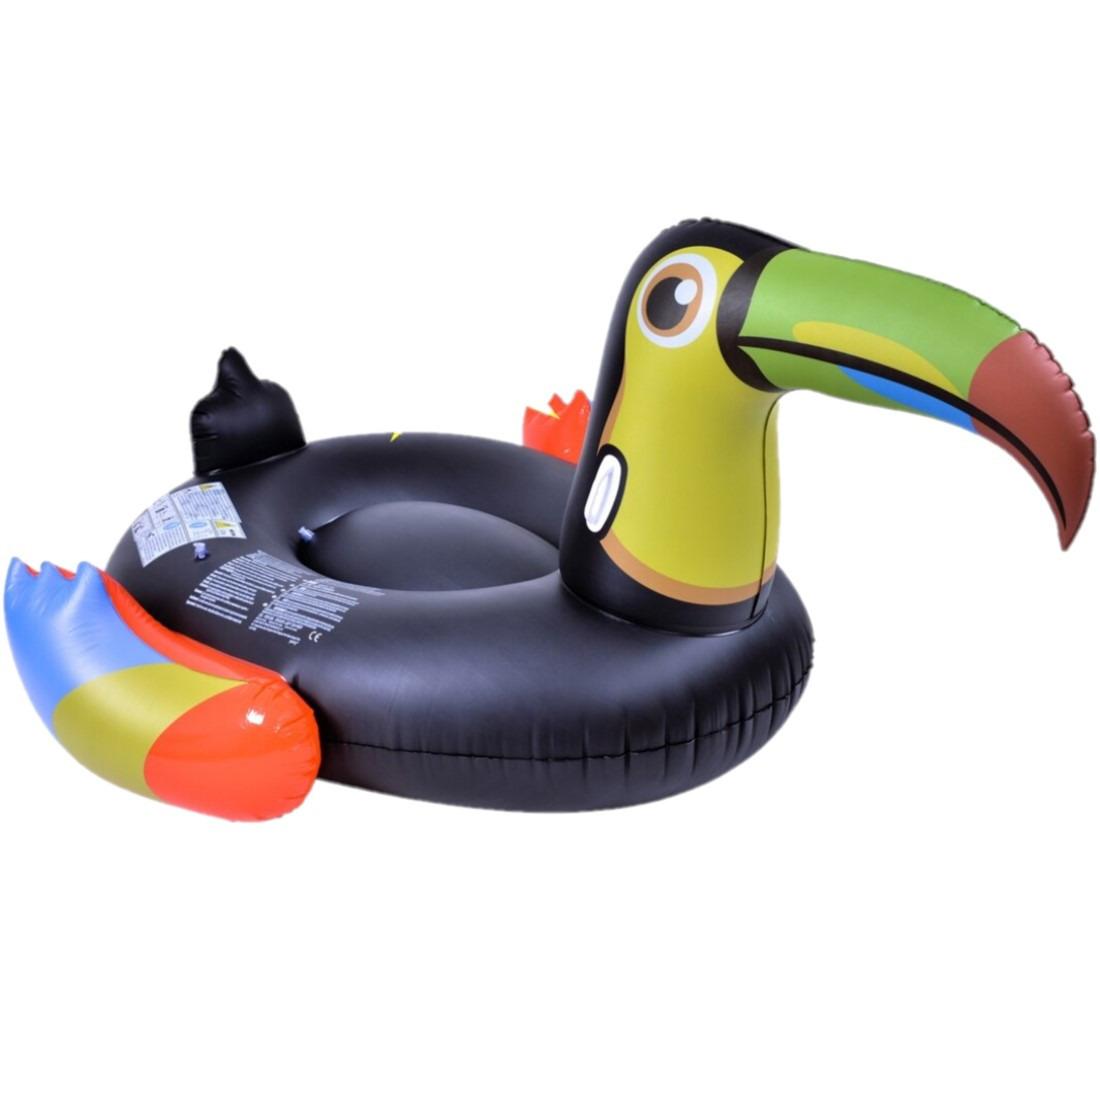 Opblaasbare zwembad luchtbed-ride-on dieren toekan 208 x 156 cm